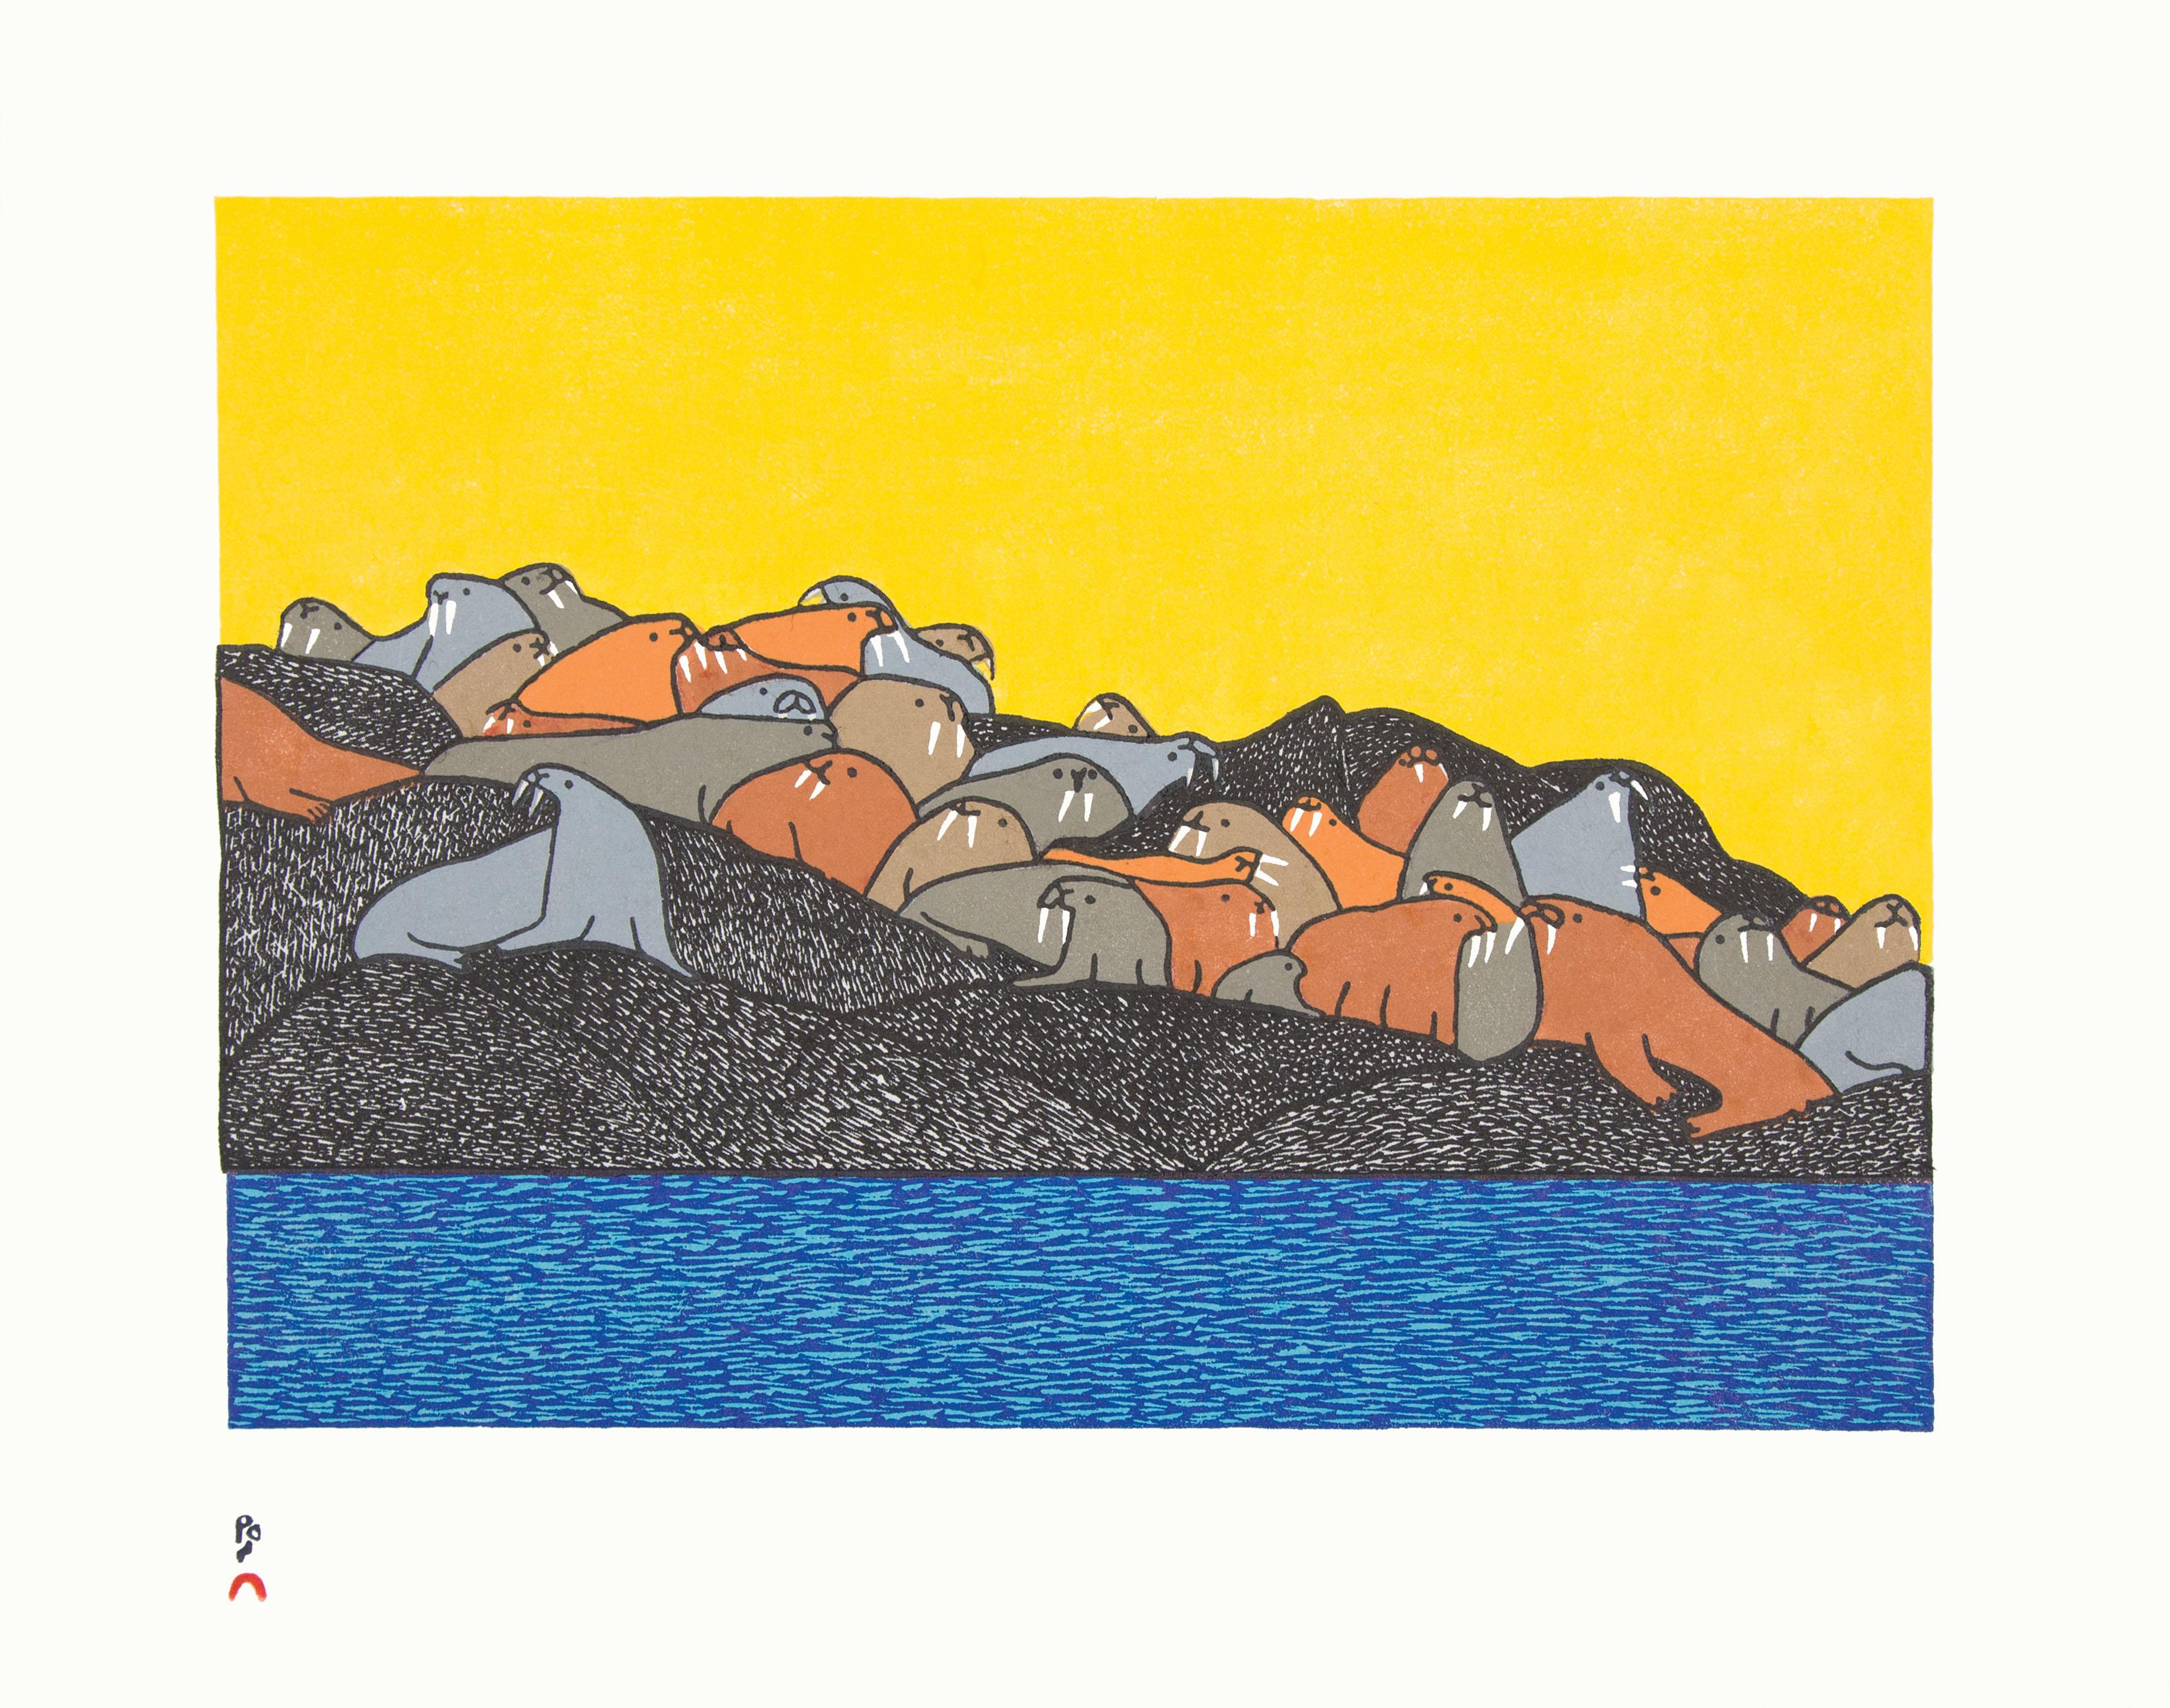 NINGIUKULU TEEVEE Uunnijut (Relaxing After a Meal) Stonecut Printer: Qiatsuk Niviaqsi 39 x 49.3 cm; 15 1/4 x 17 in. $560